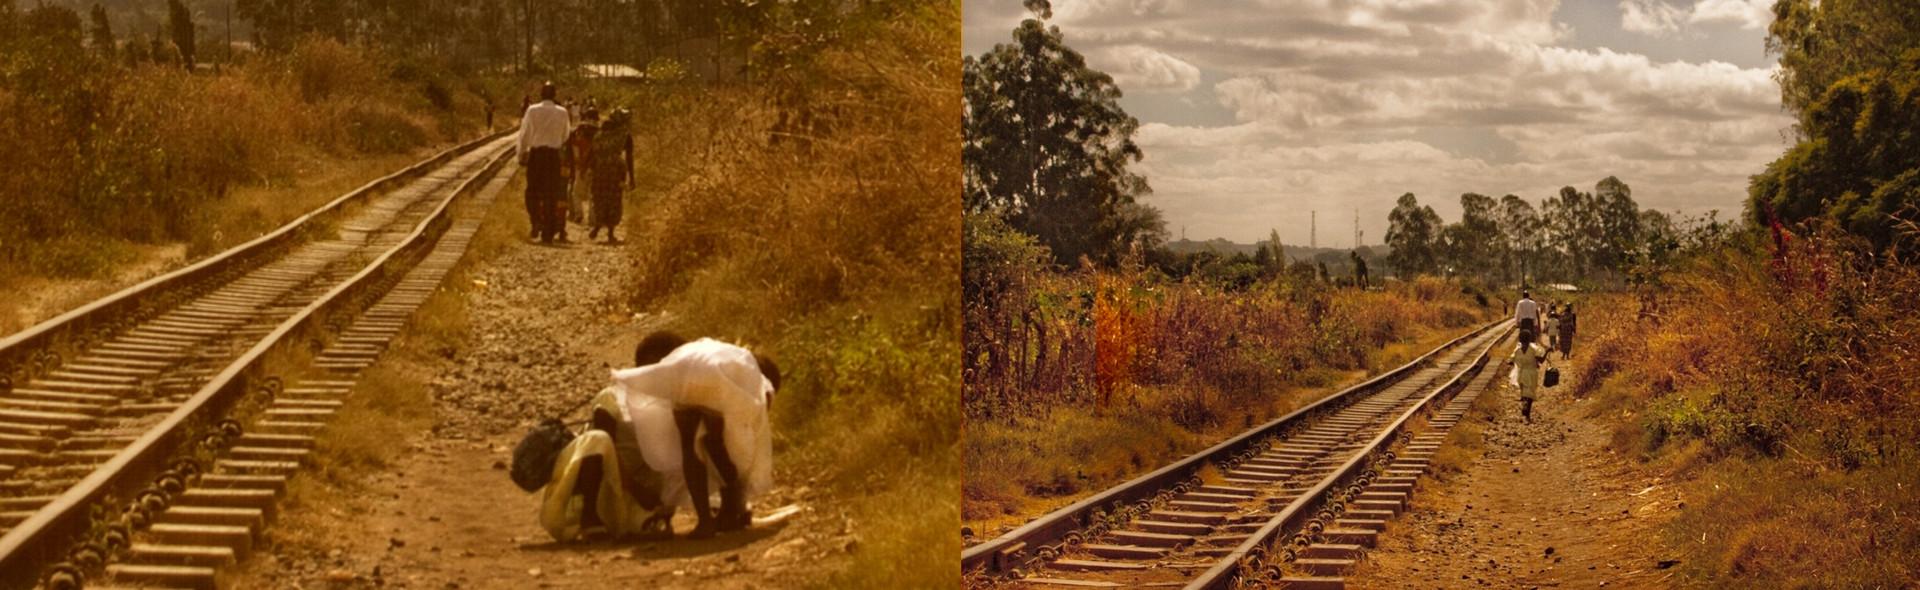 trilho do trem (2).jpg